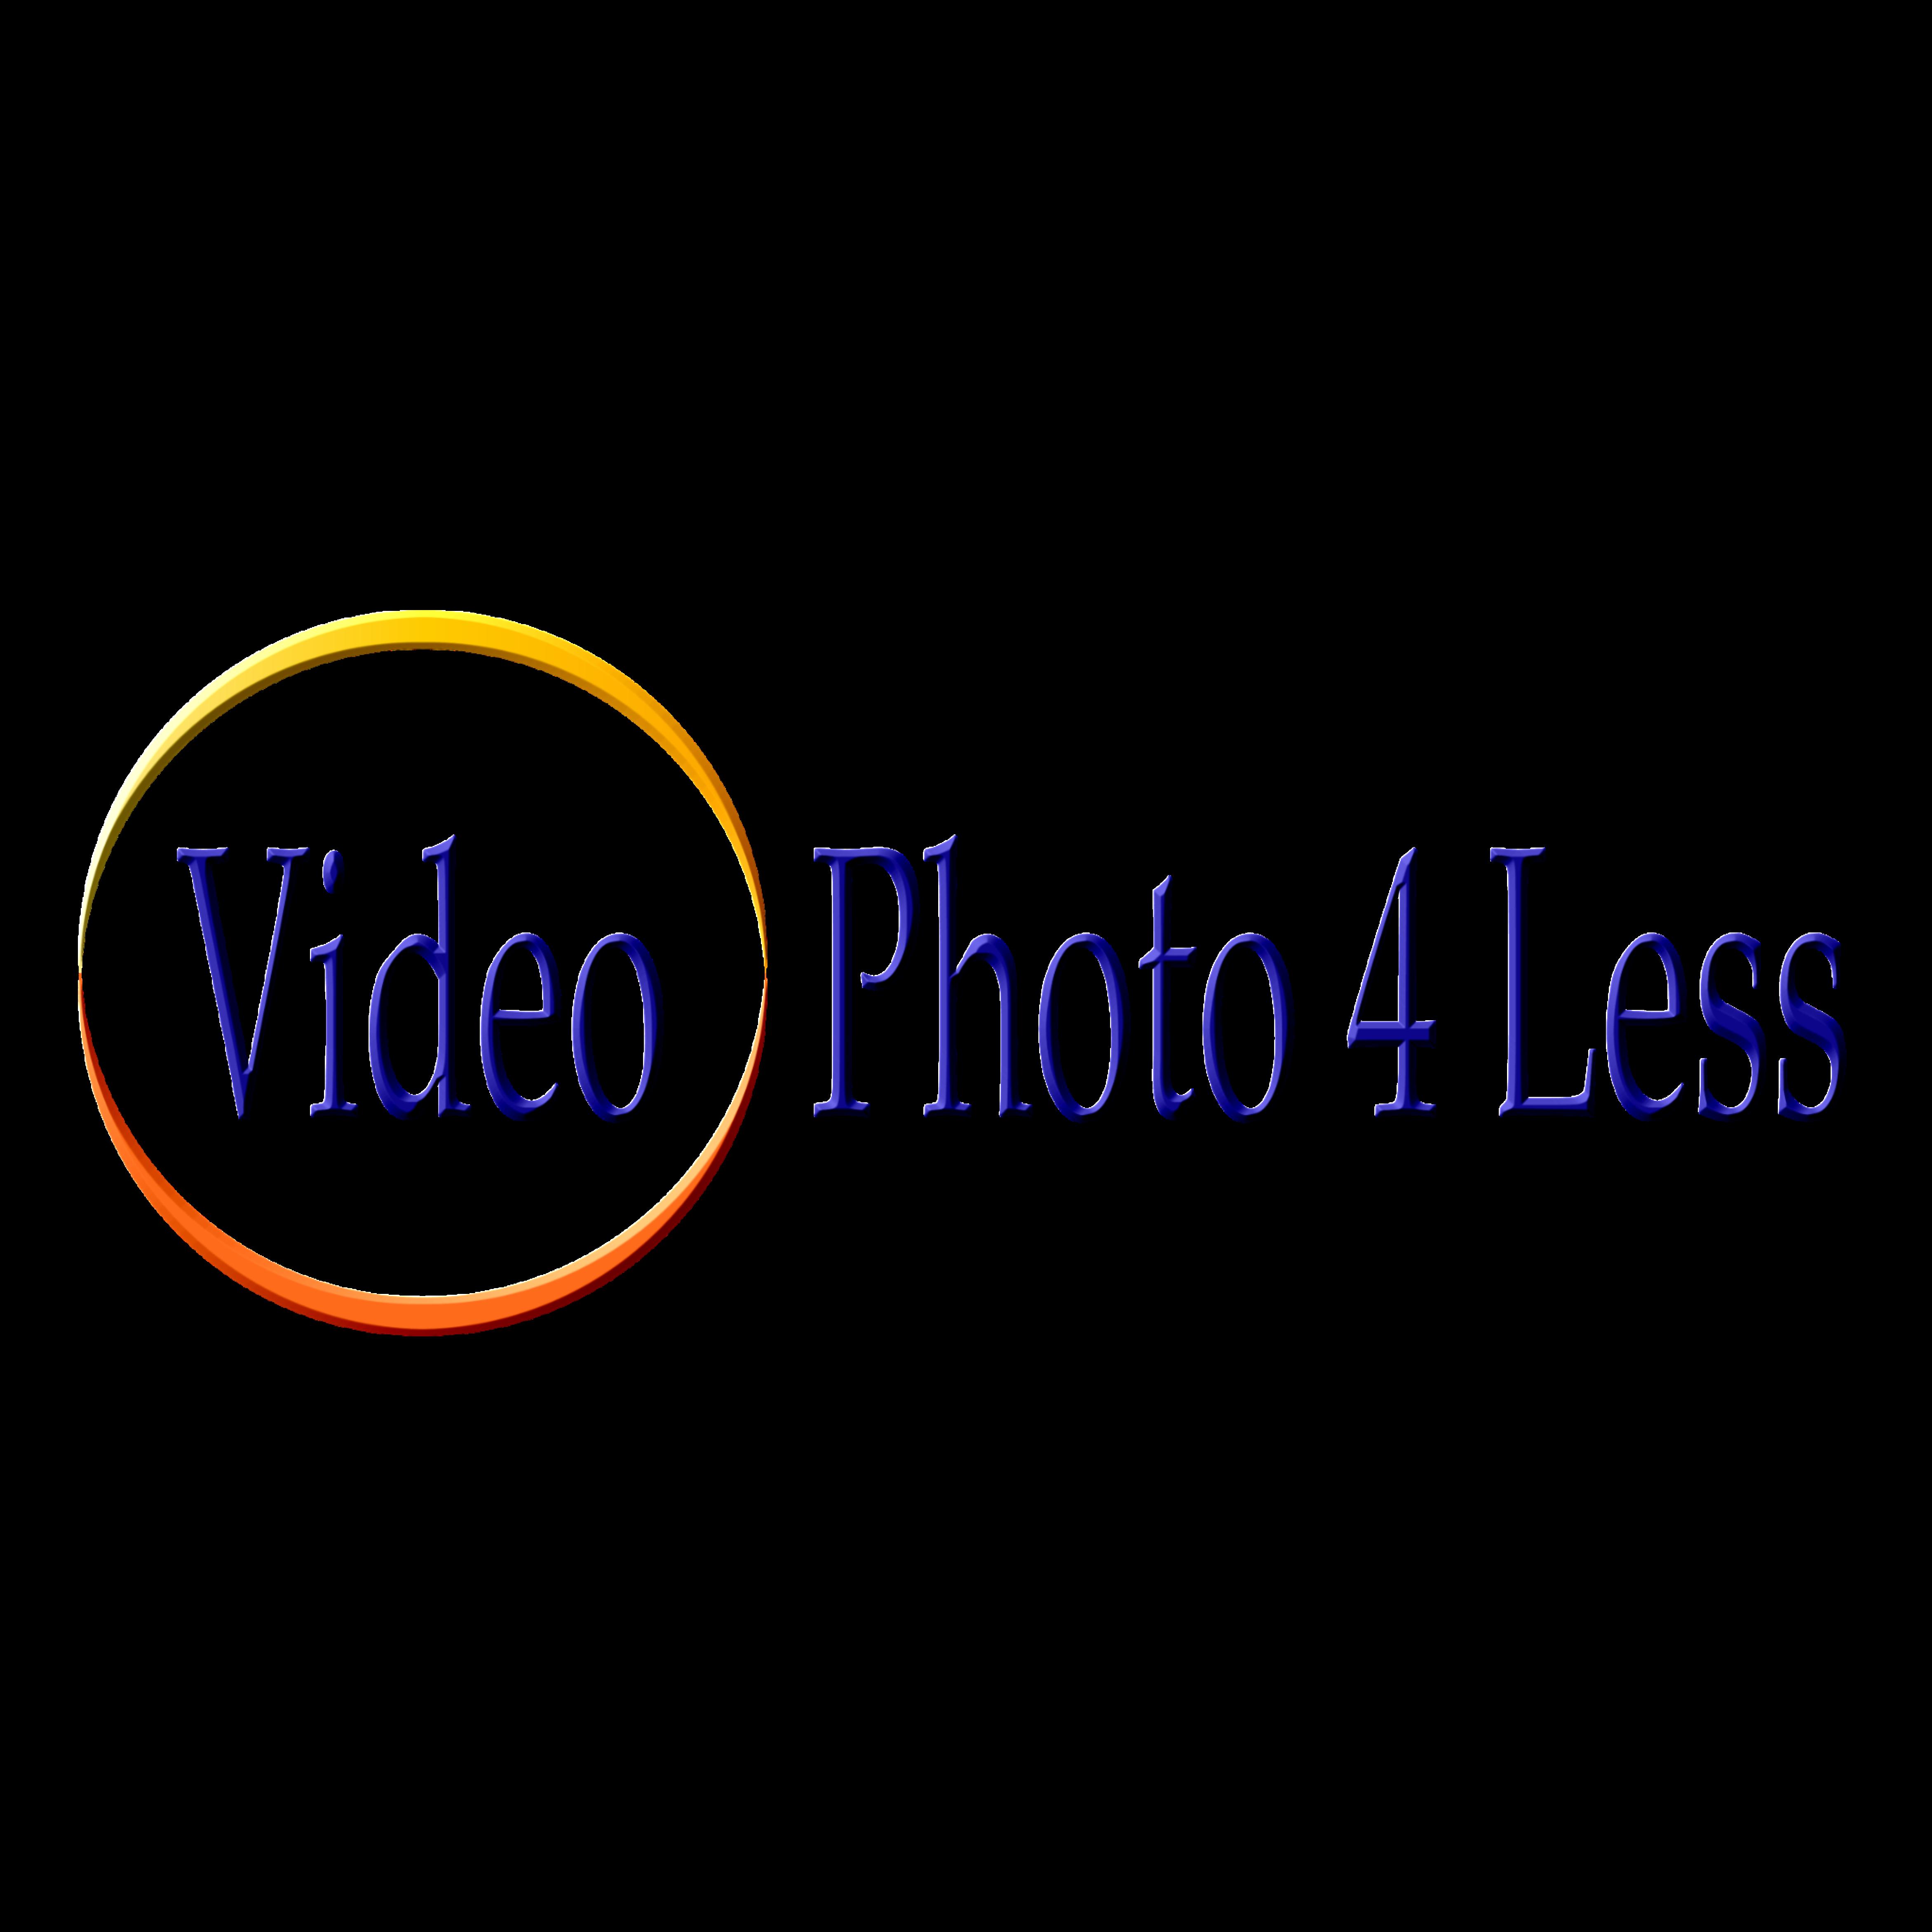 Video Photo 4 Less